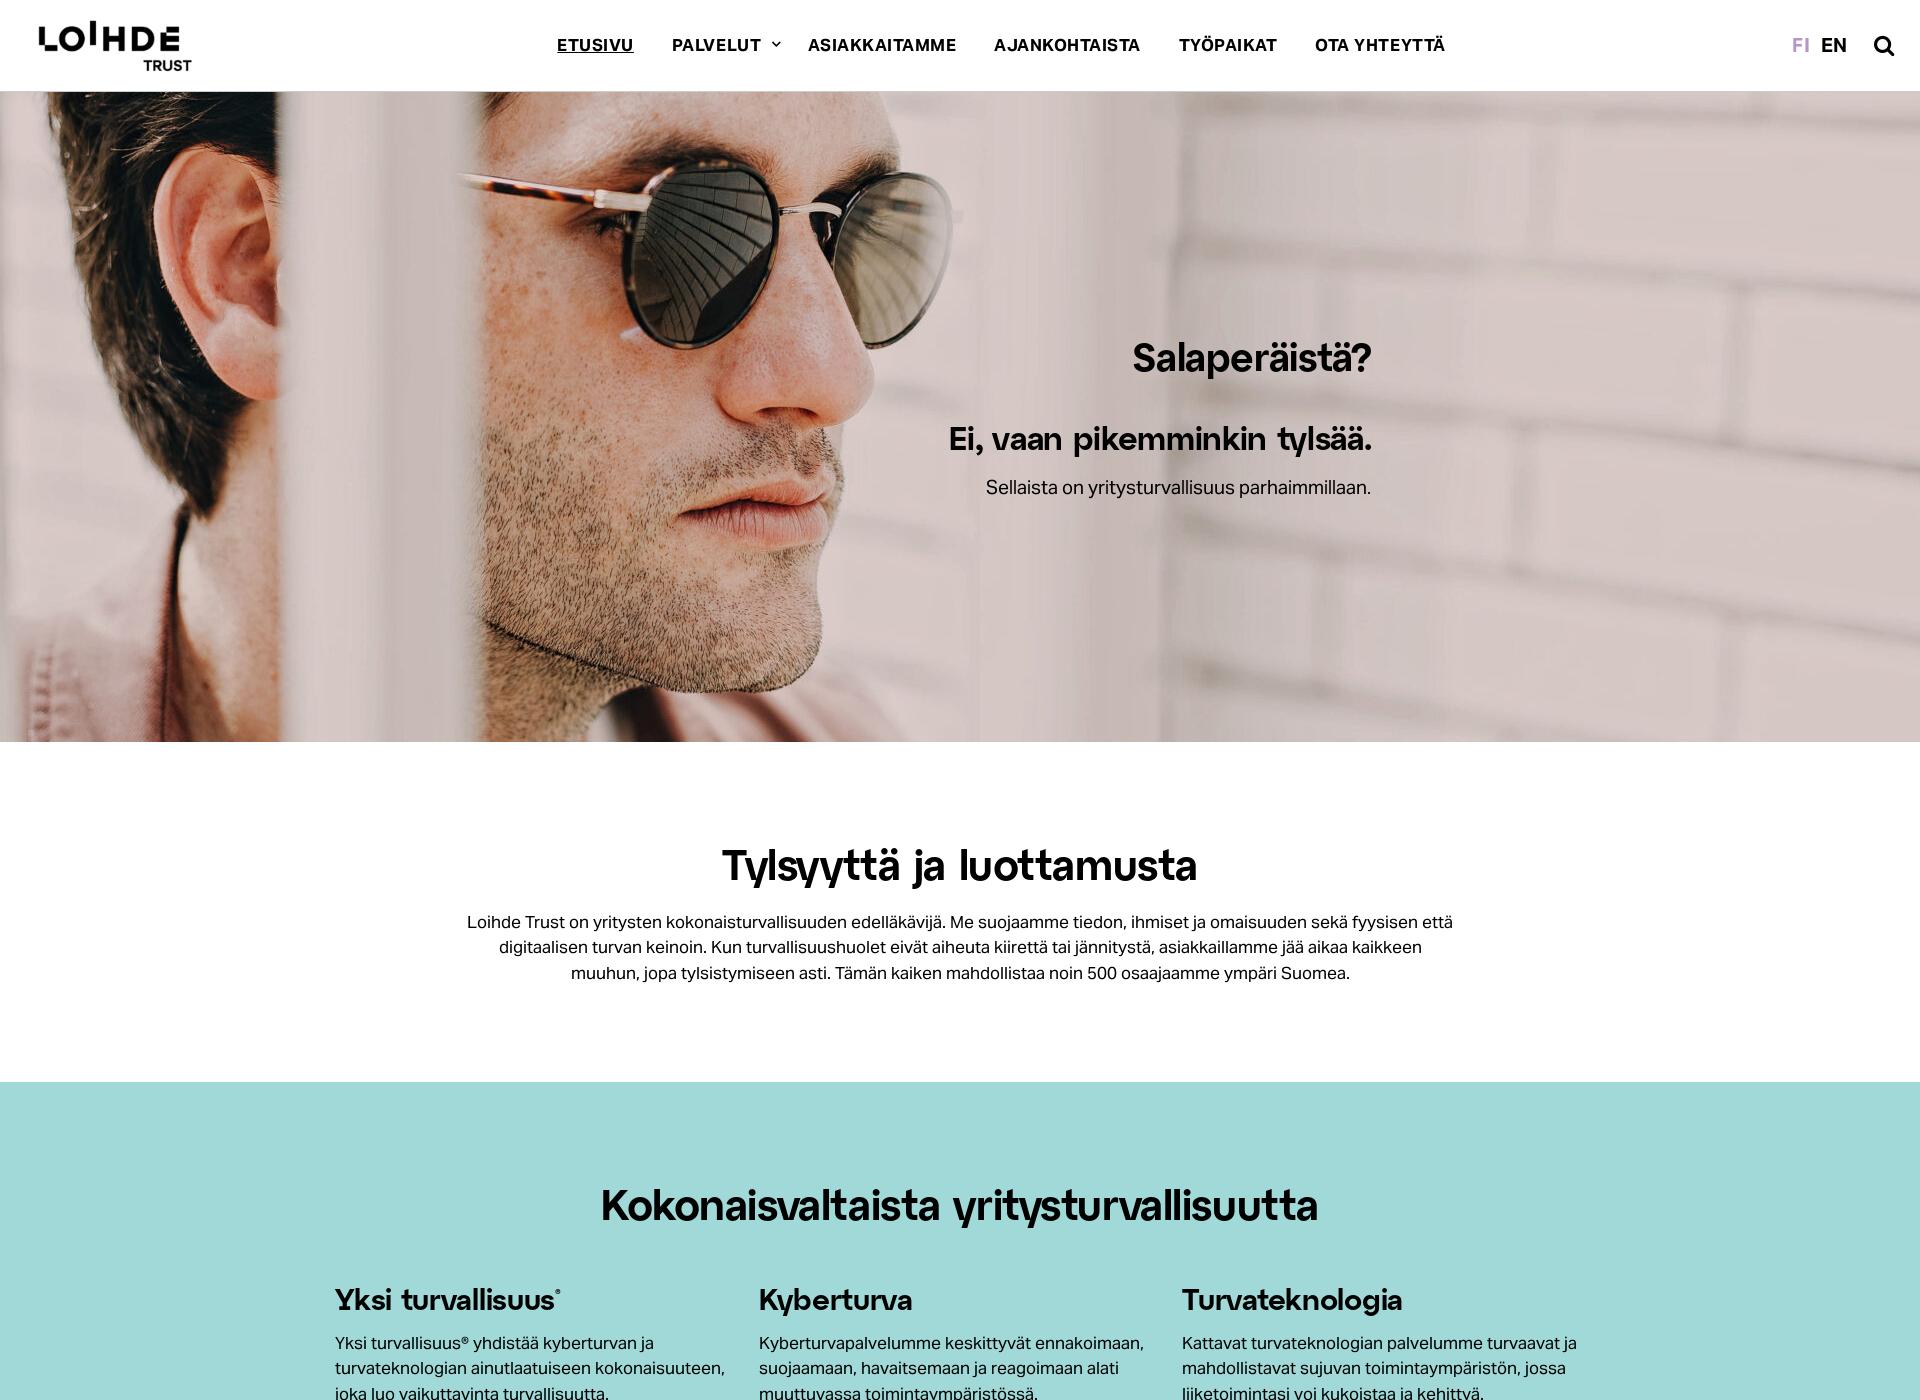 Screenshot for loihdetrust.com